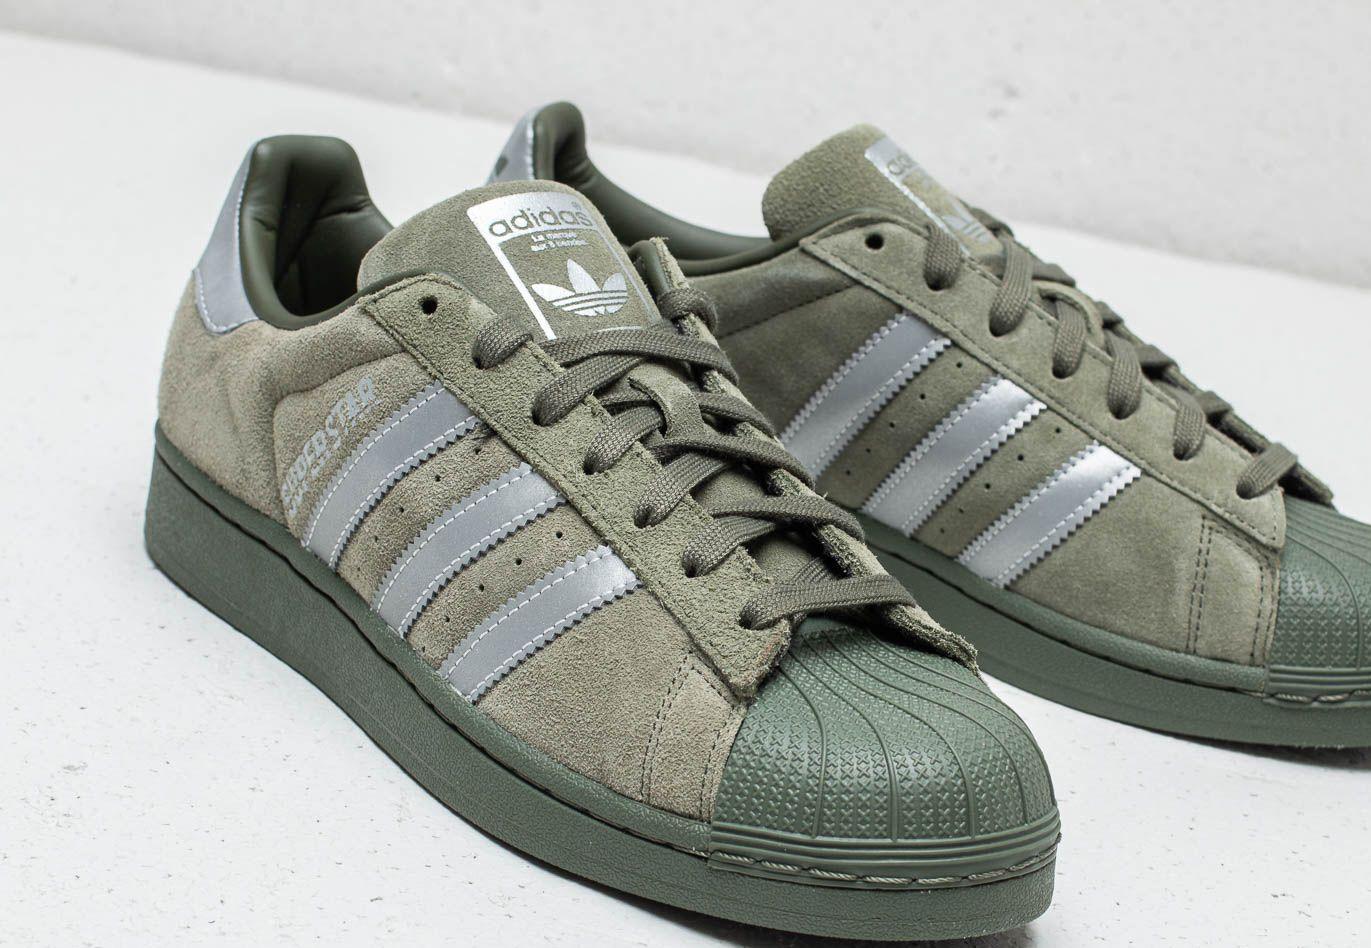 Adidas Adidas NMD R1 Cargo GreenBlack from Stadium Goods   more